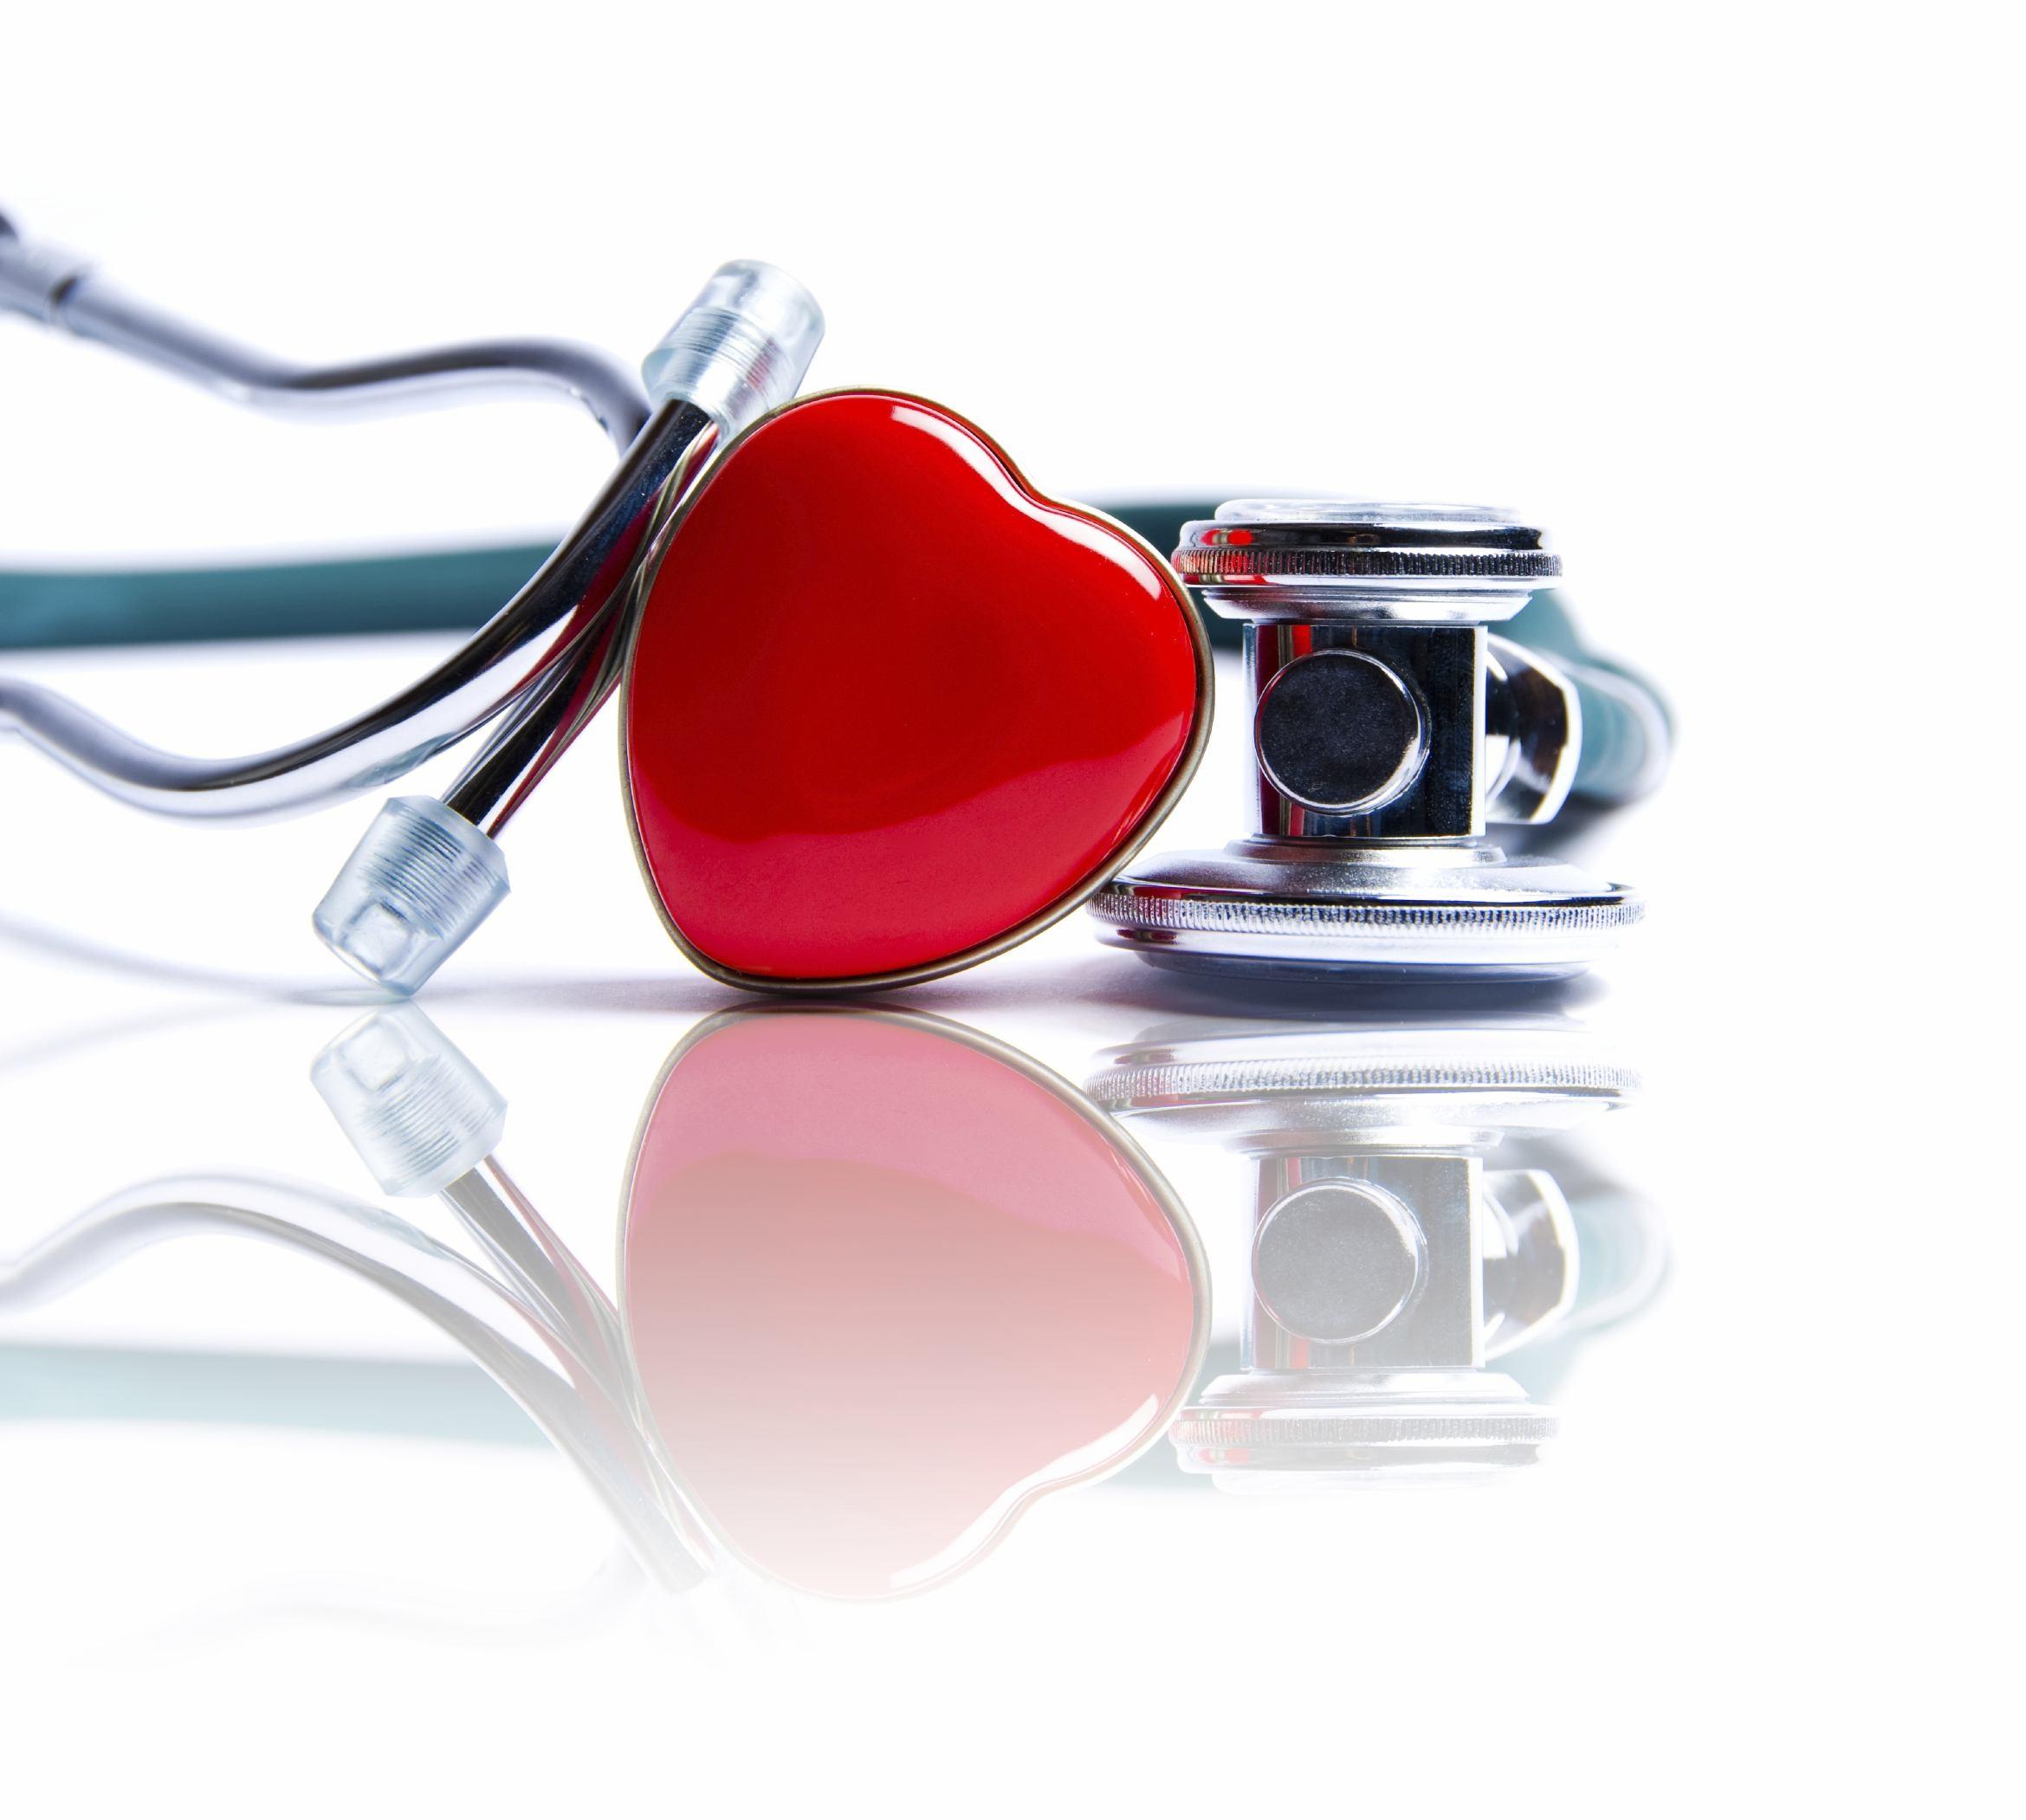 diagnose auto-immuunziekte coeliakie